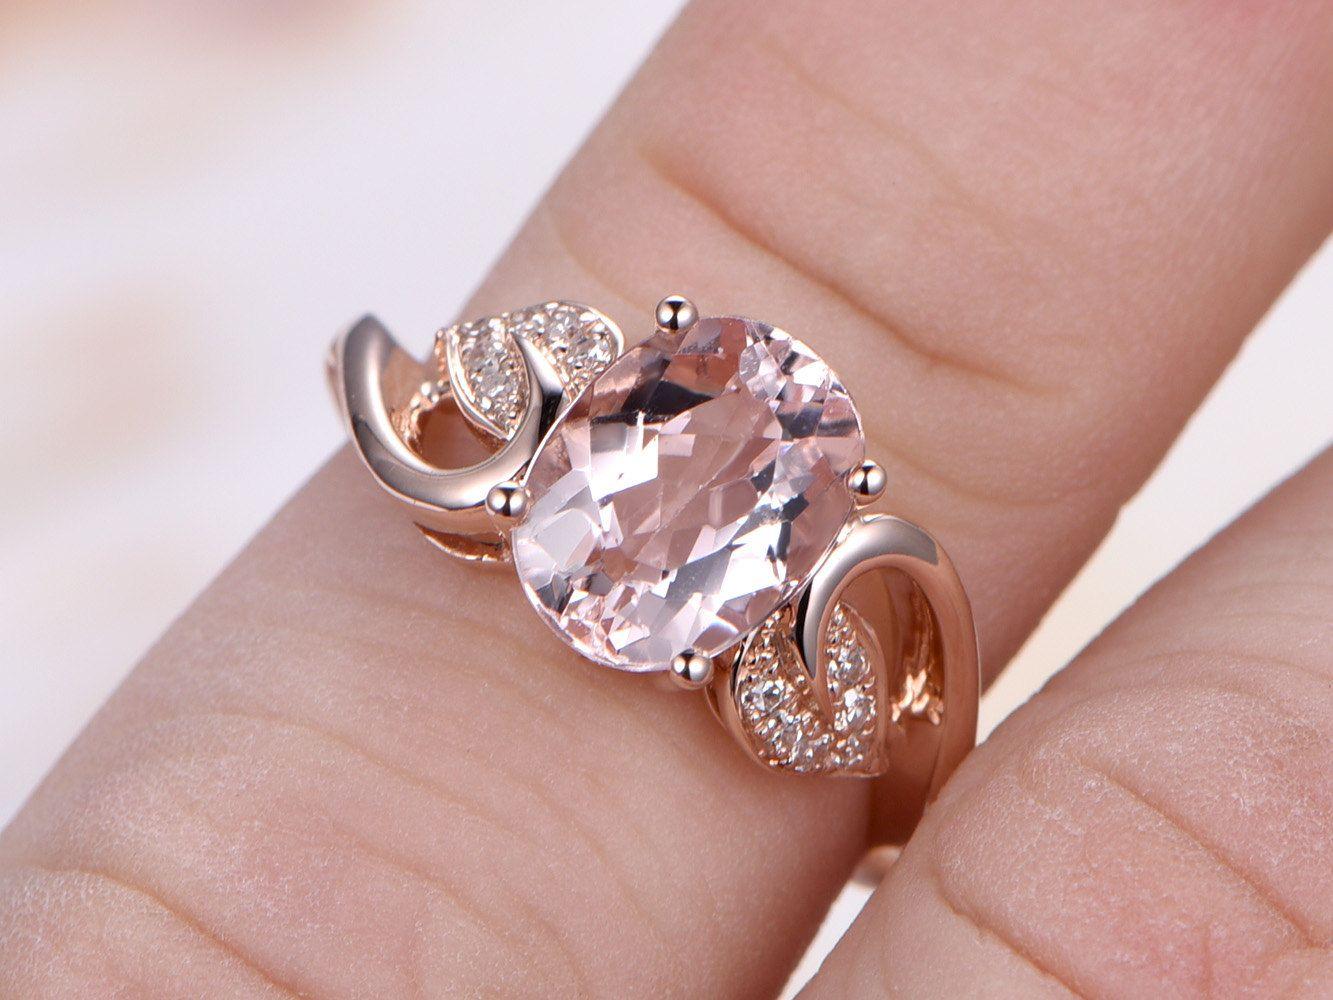 Floral Design Morganite Ring,Pink Morganite Engagement Ring,7x9mm ...